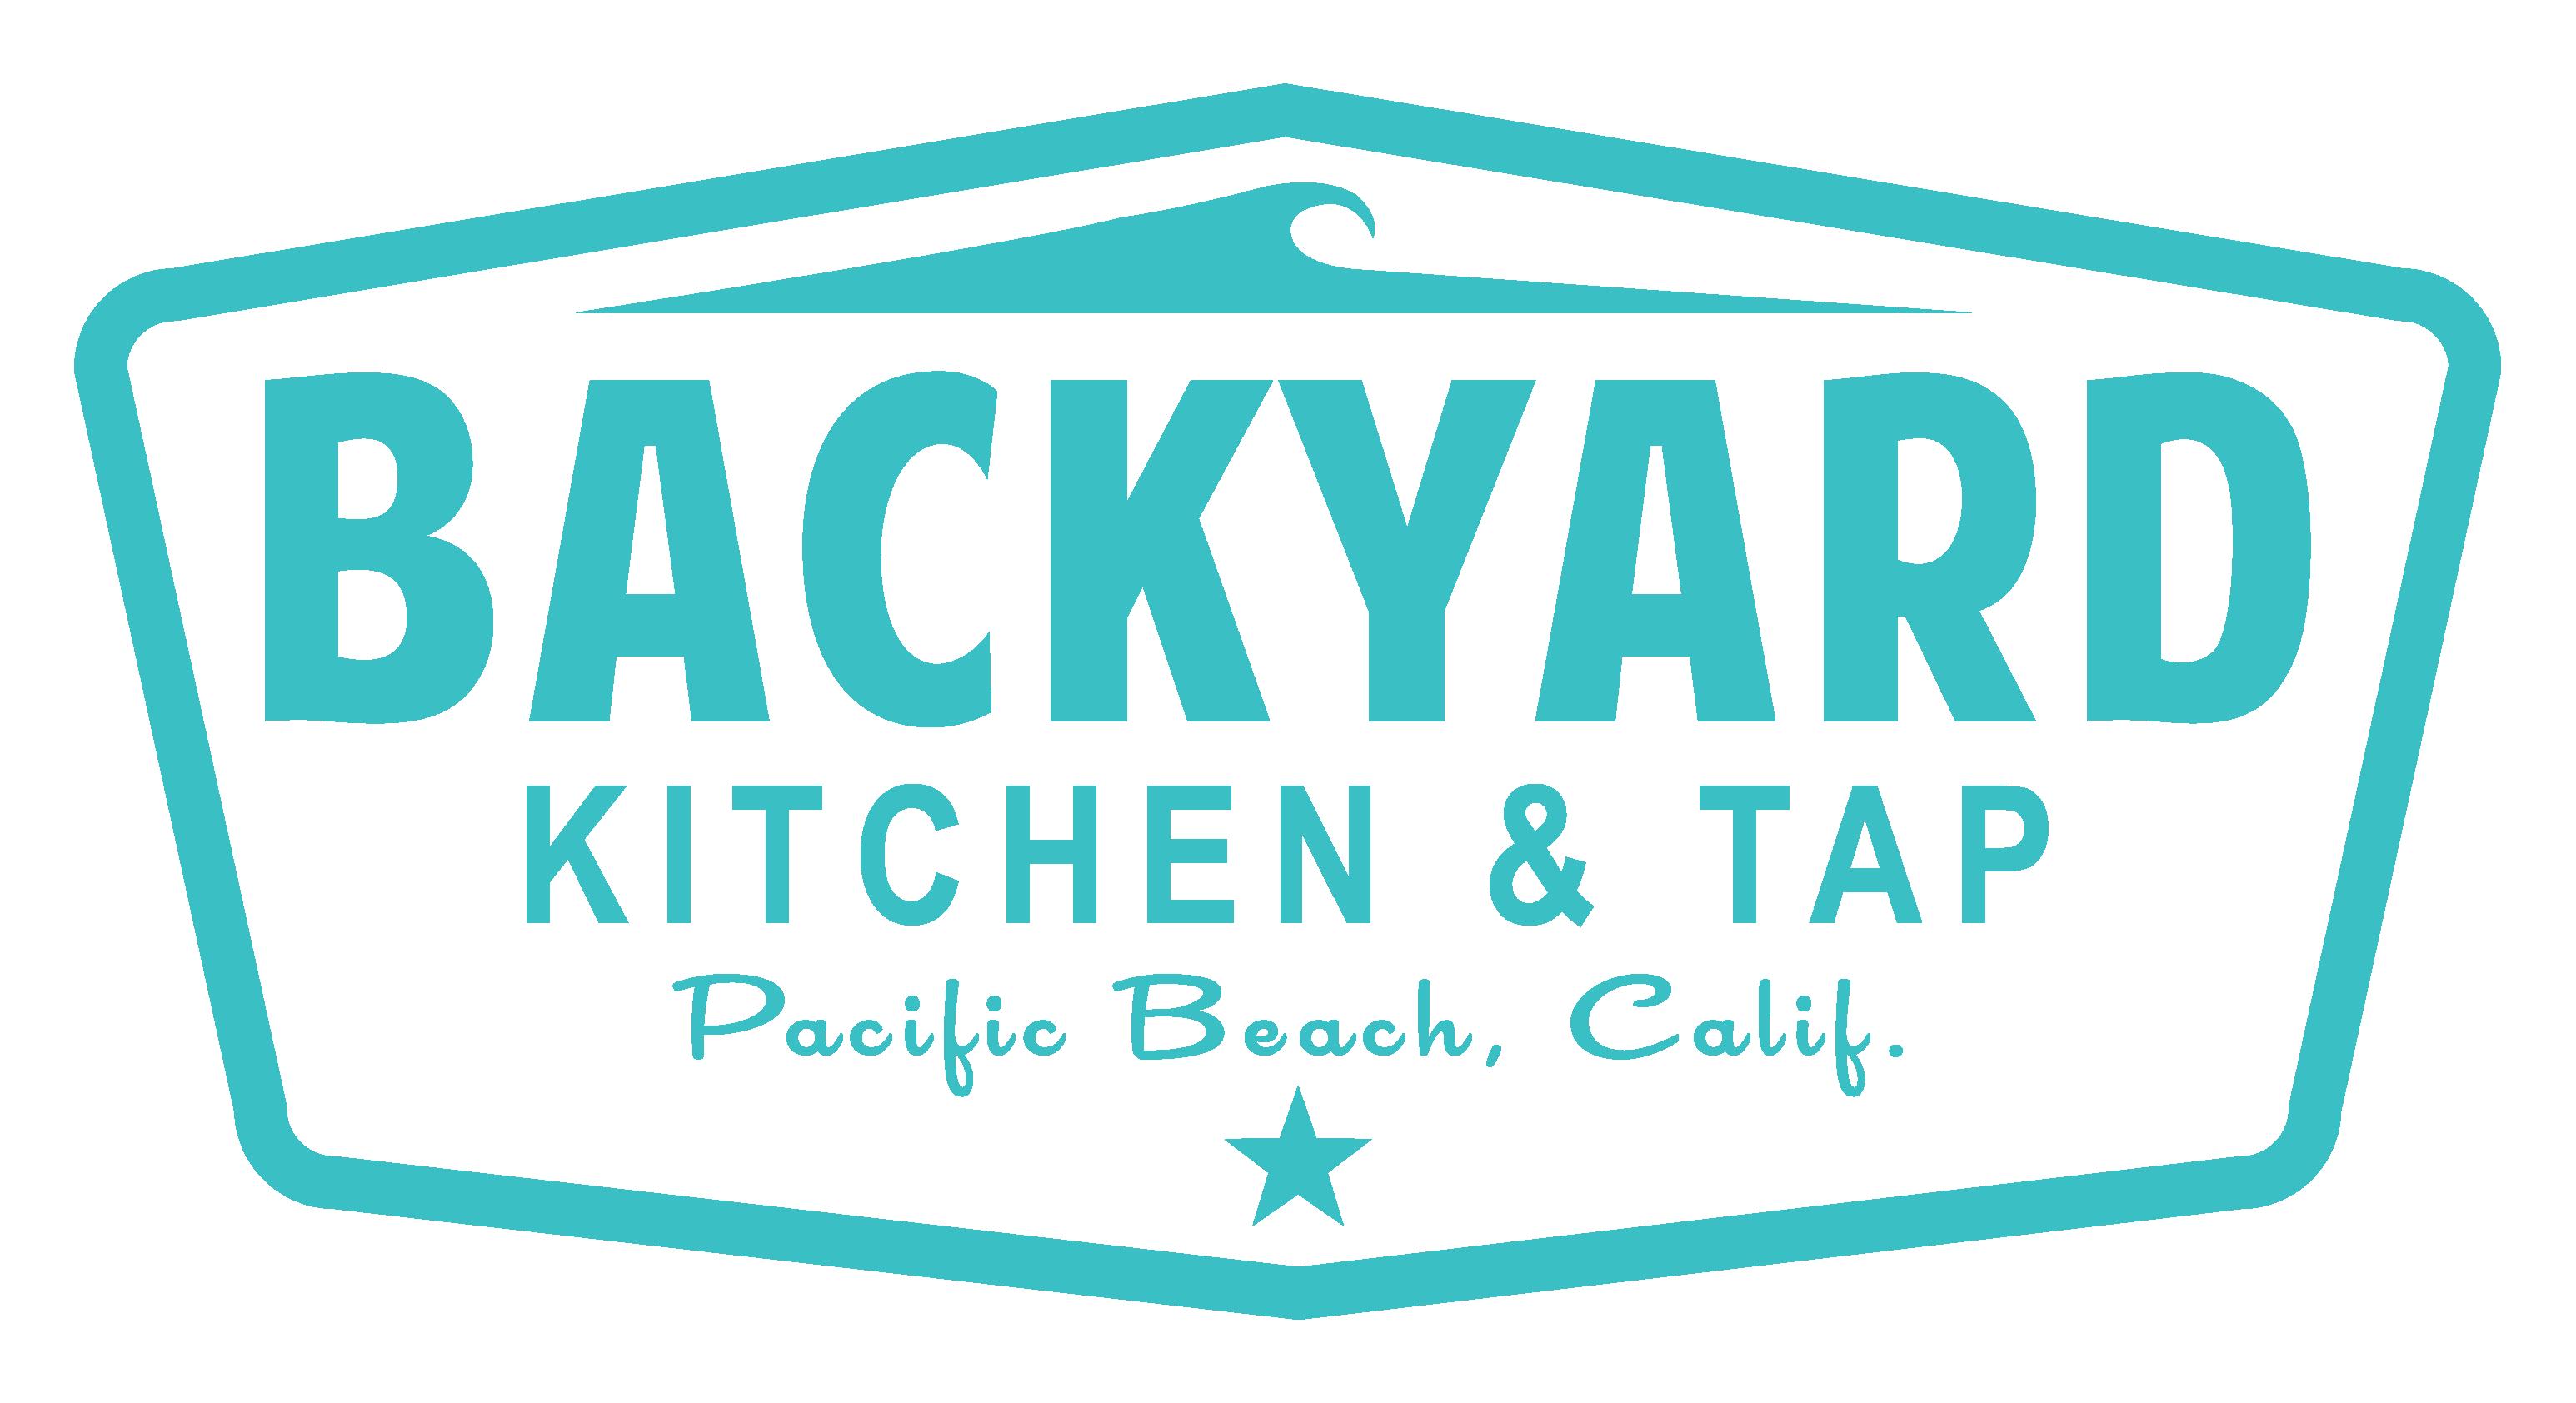 Pacific Beach Restaurant Bar, Happy Hour, Brunch & Drinks